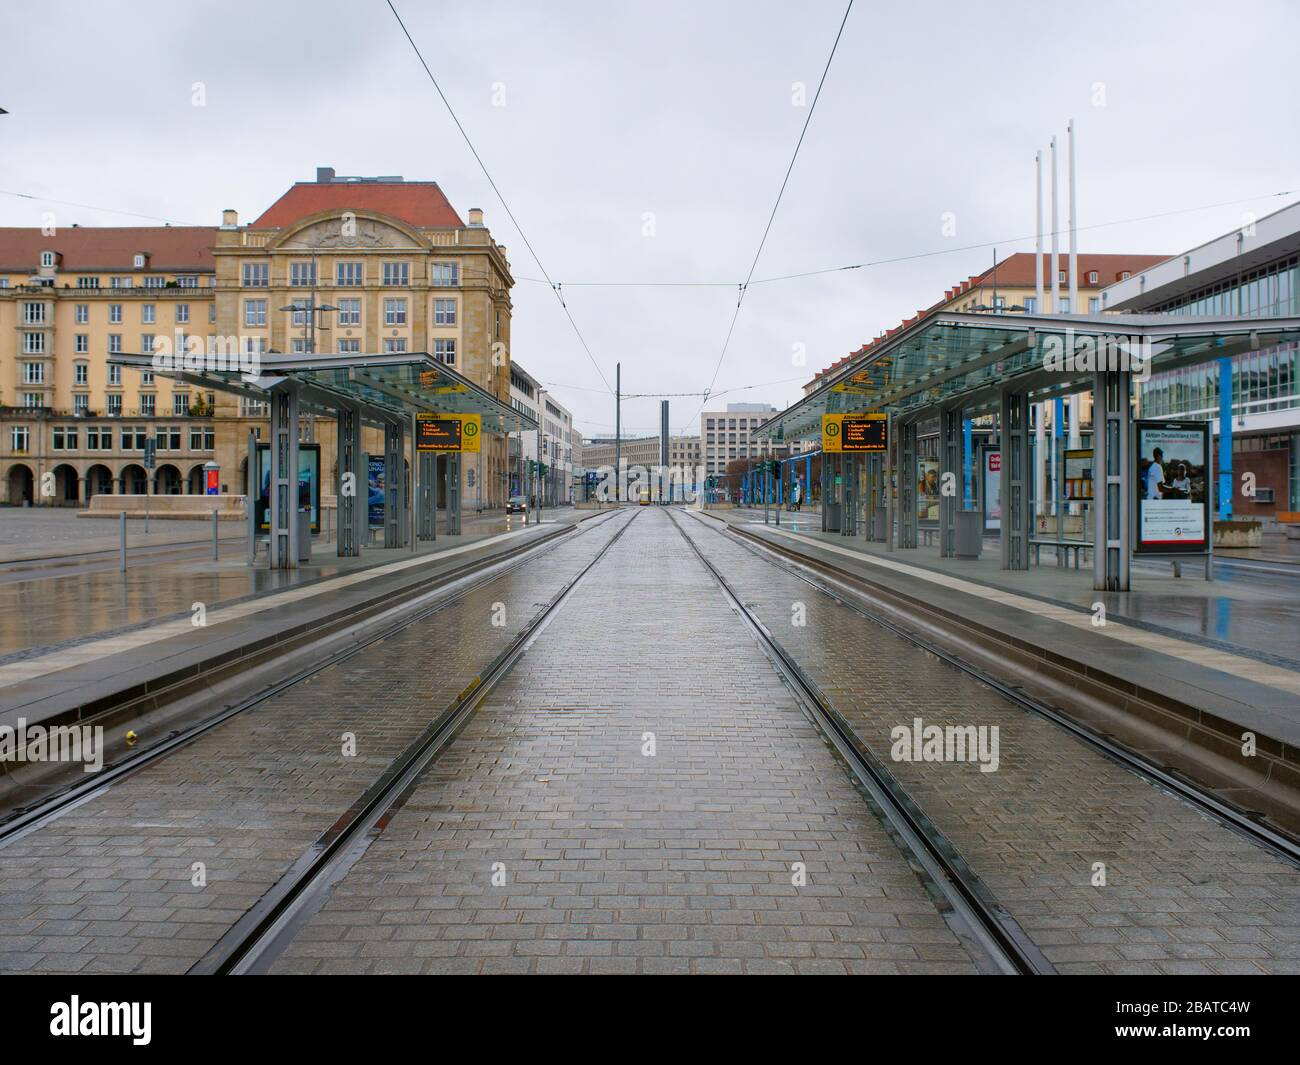 Dresden Altmarkt Tram Haltestelle DVB während Coronavirus Lockdown COVID-19 Ausgangssperre im Regen Stock Photo